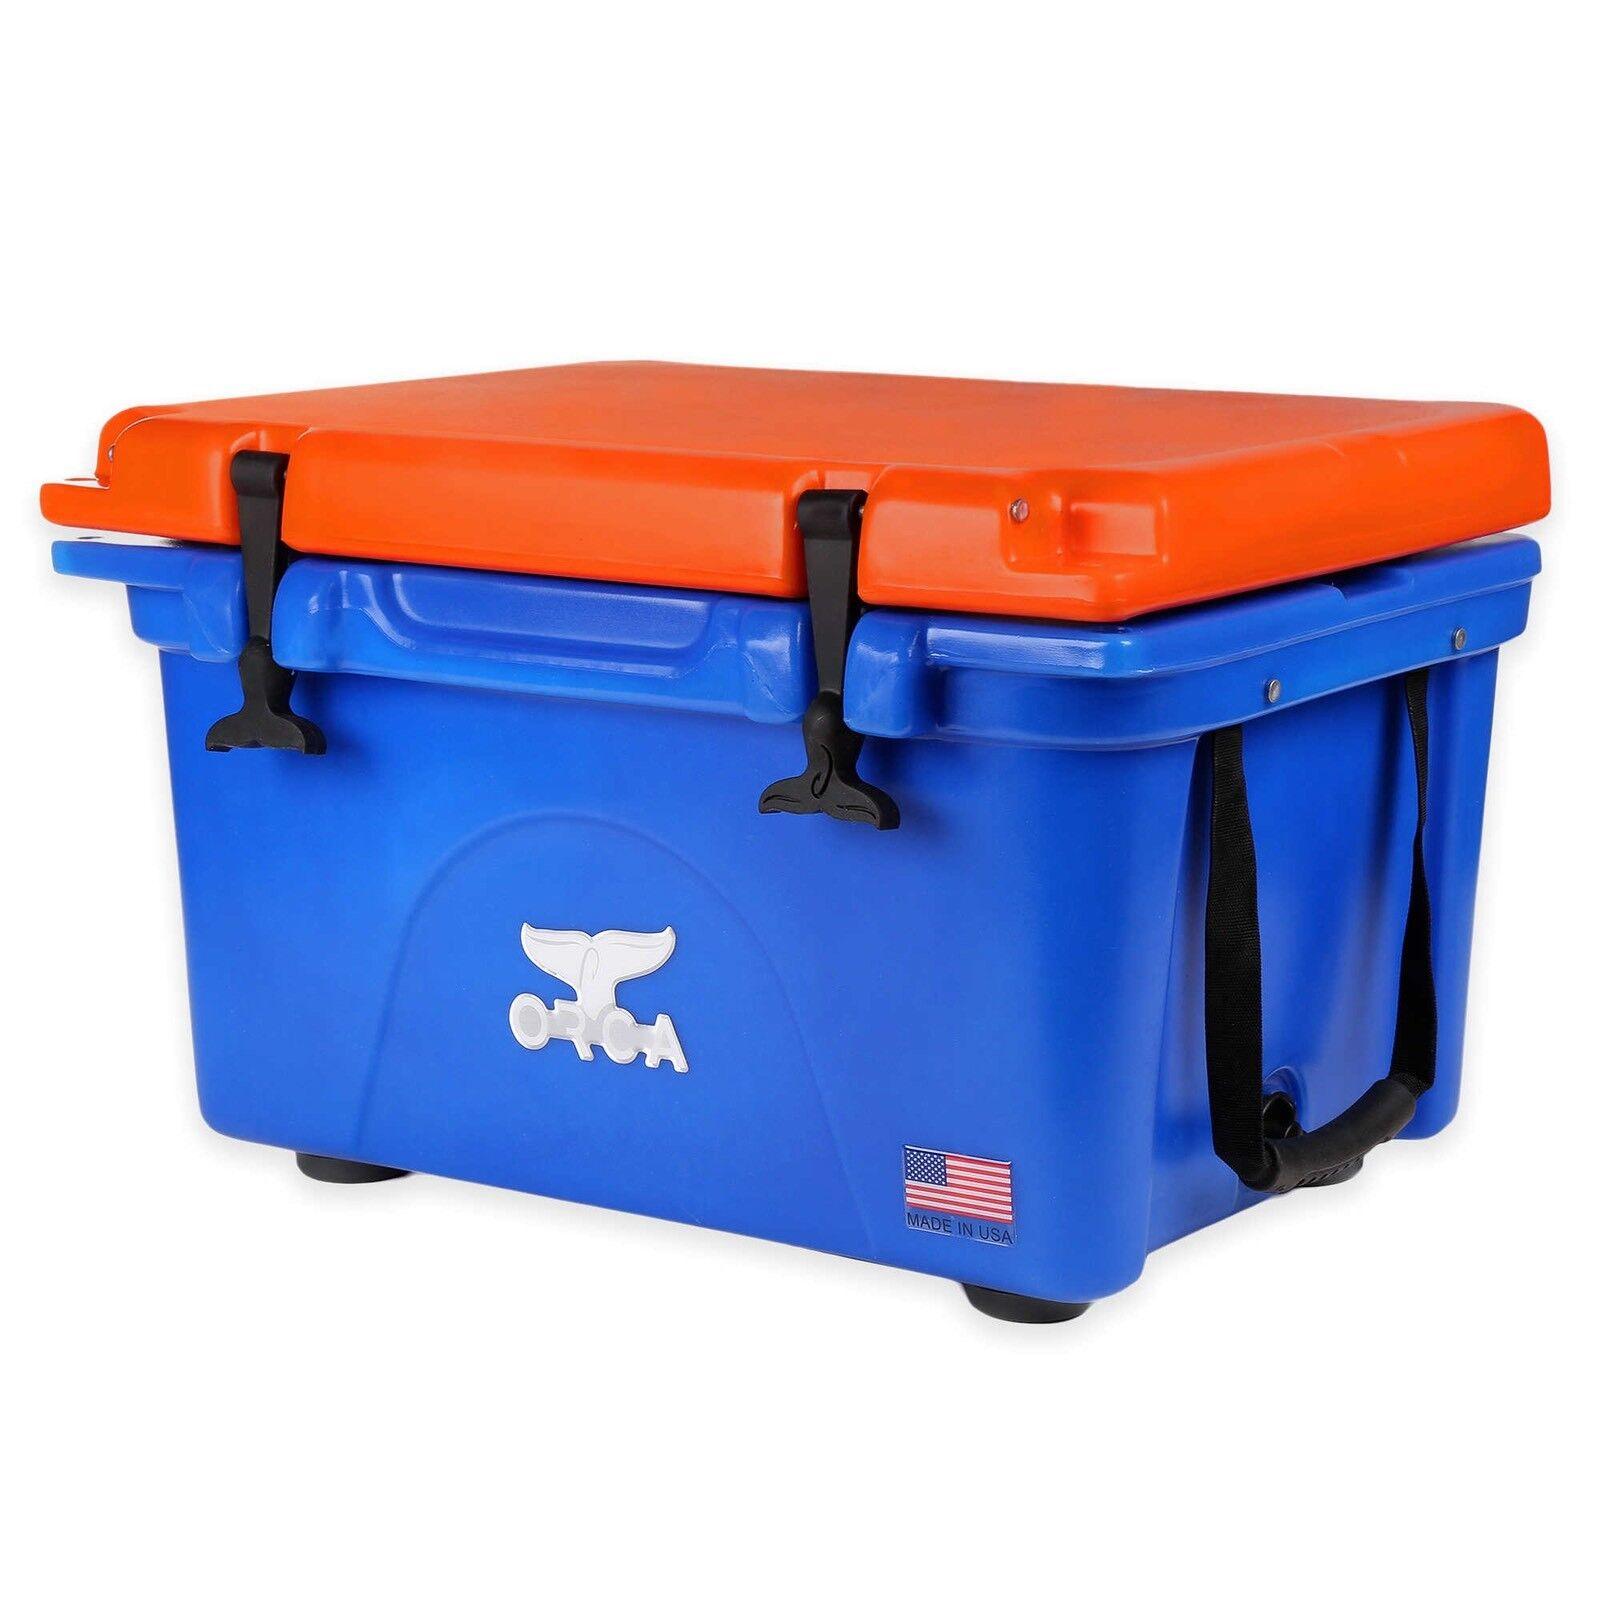 ORCA Blau & Orange 26 qt Cooler   LIFETIME WARRANTY  26 QUART Blau w  Orange LID